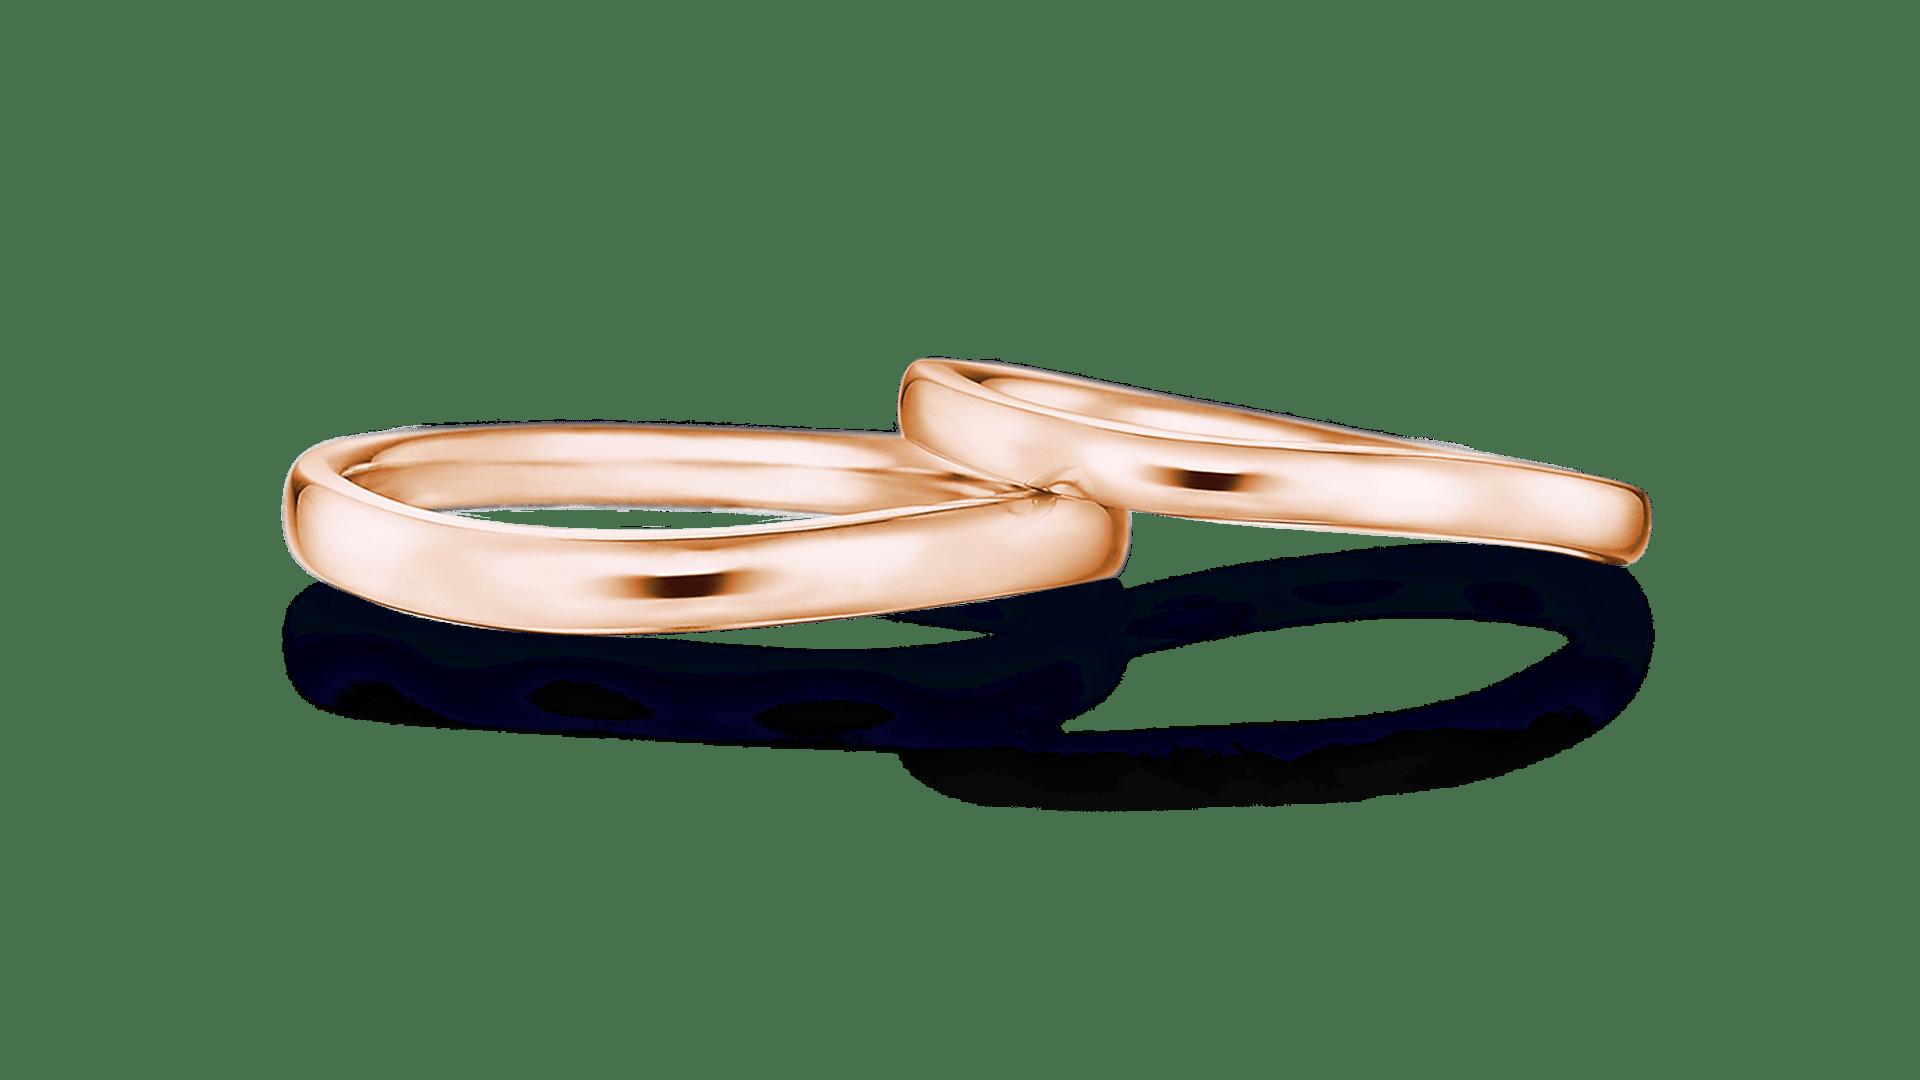 ceres plain ケレース プレーン | 結婚指輪サムネイル 1